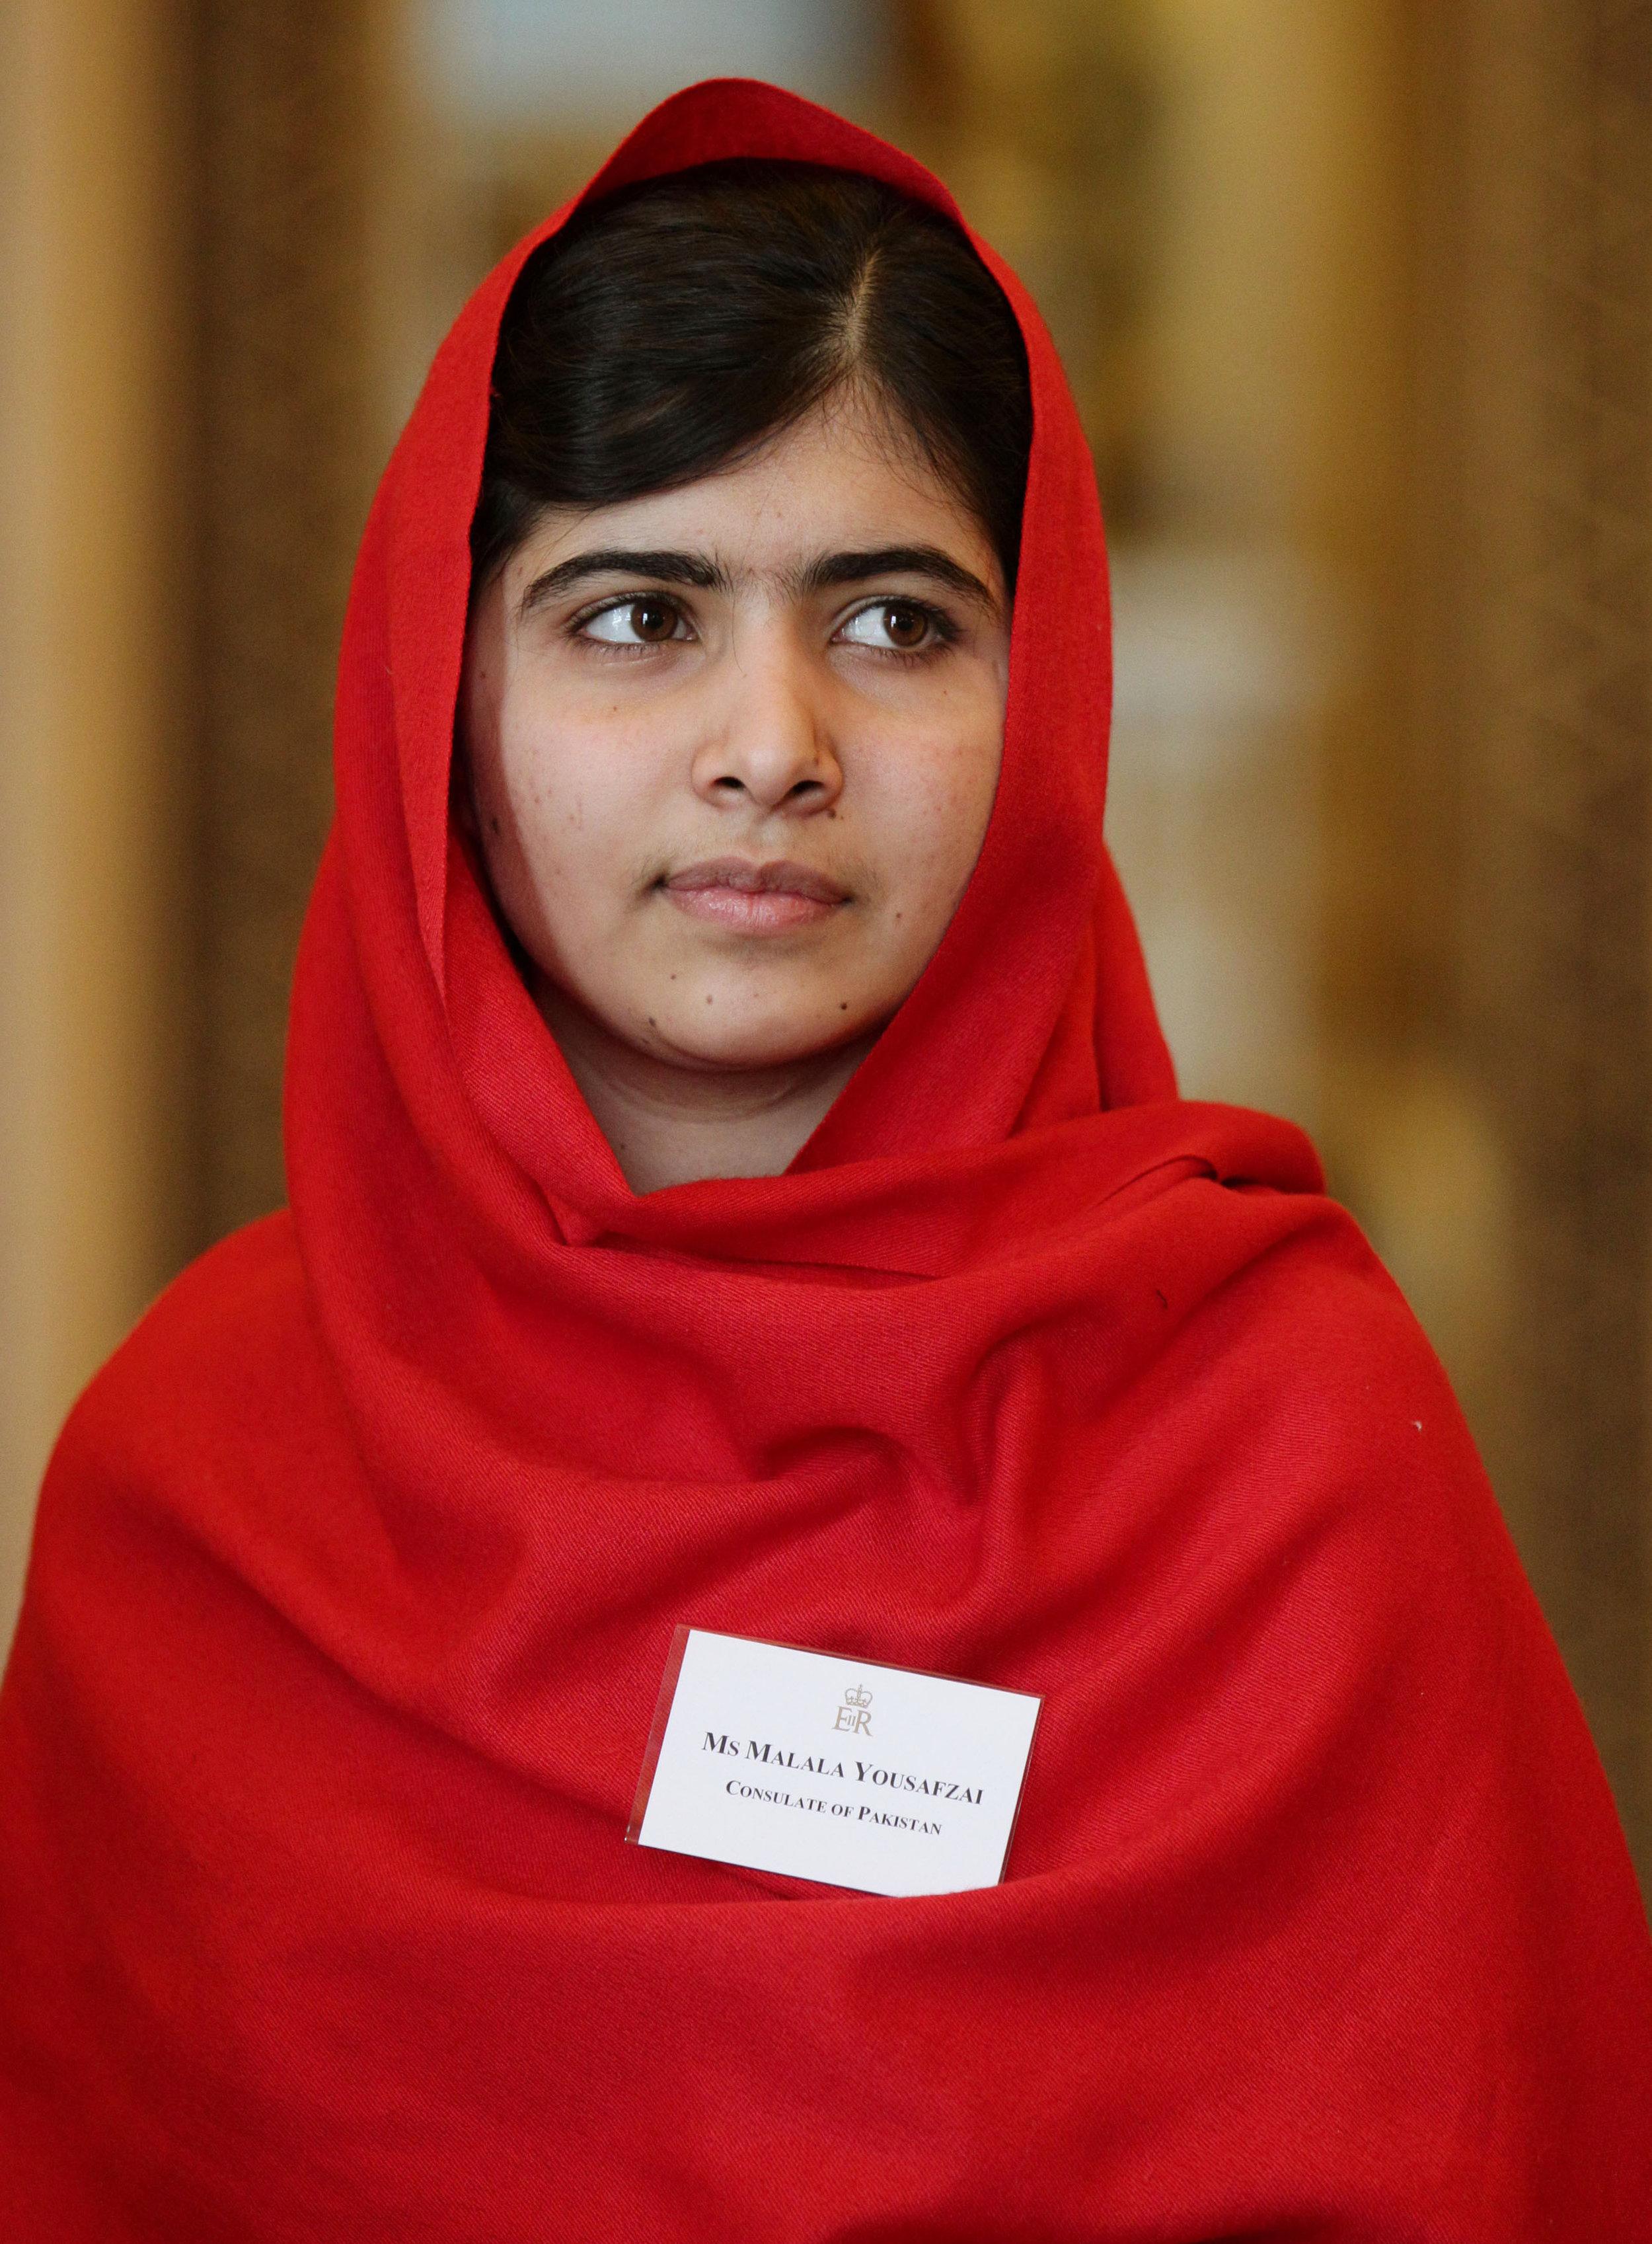 Malala Yousafzai - Youngest-ever Nobel Prize laureate, Nobel Peace Prize recipient